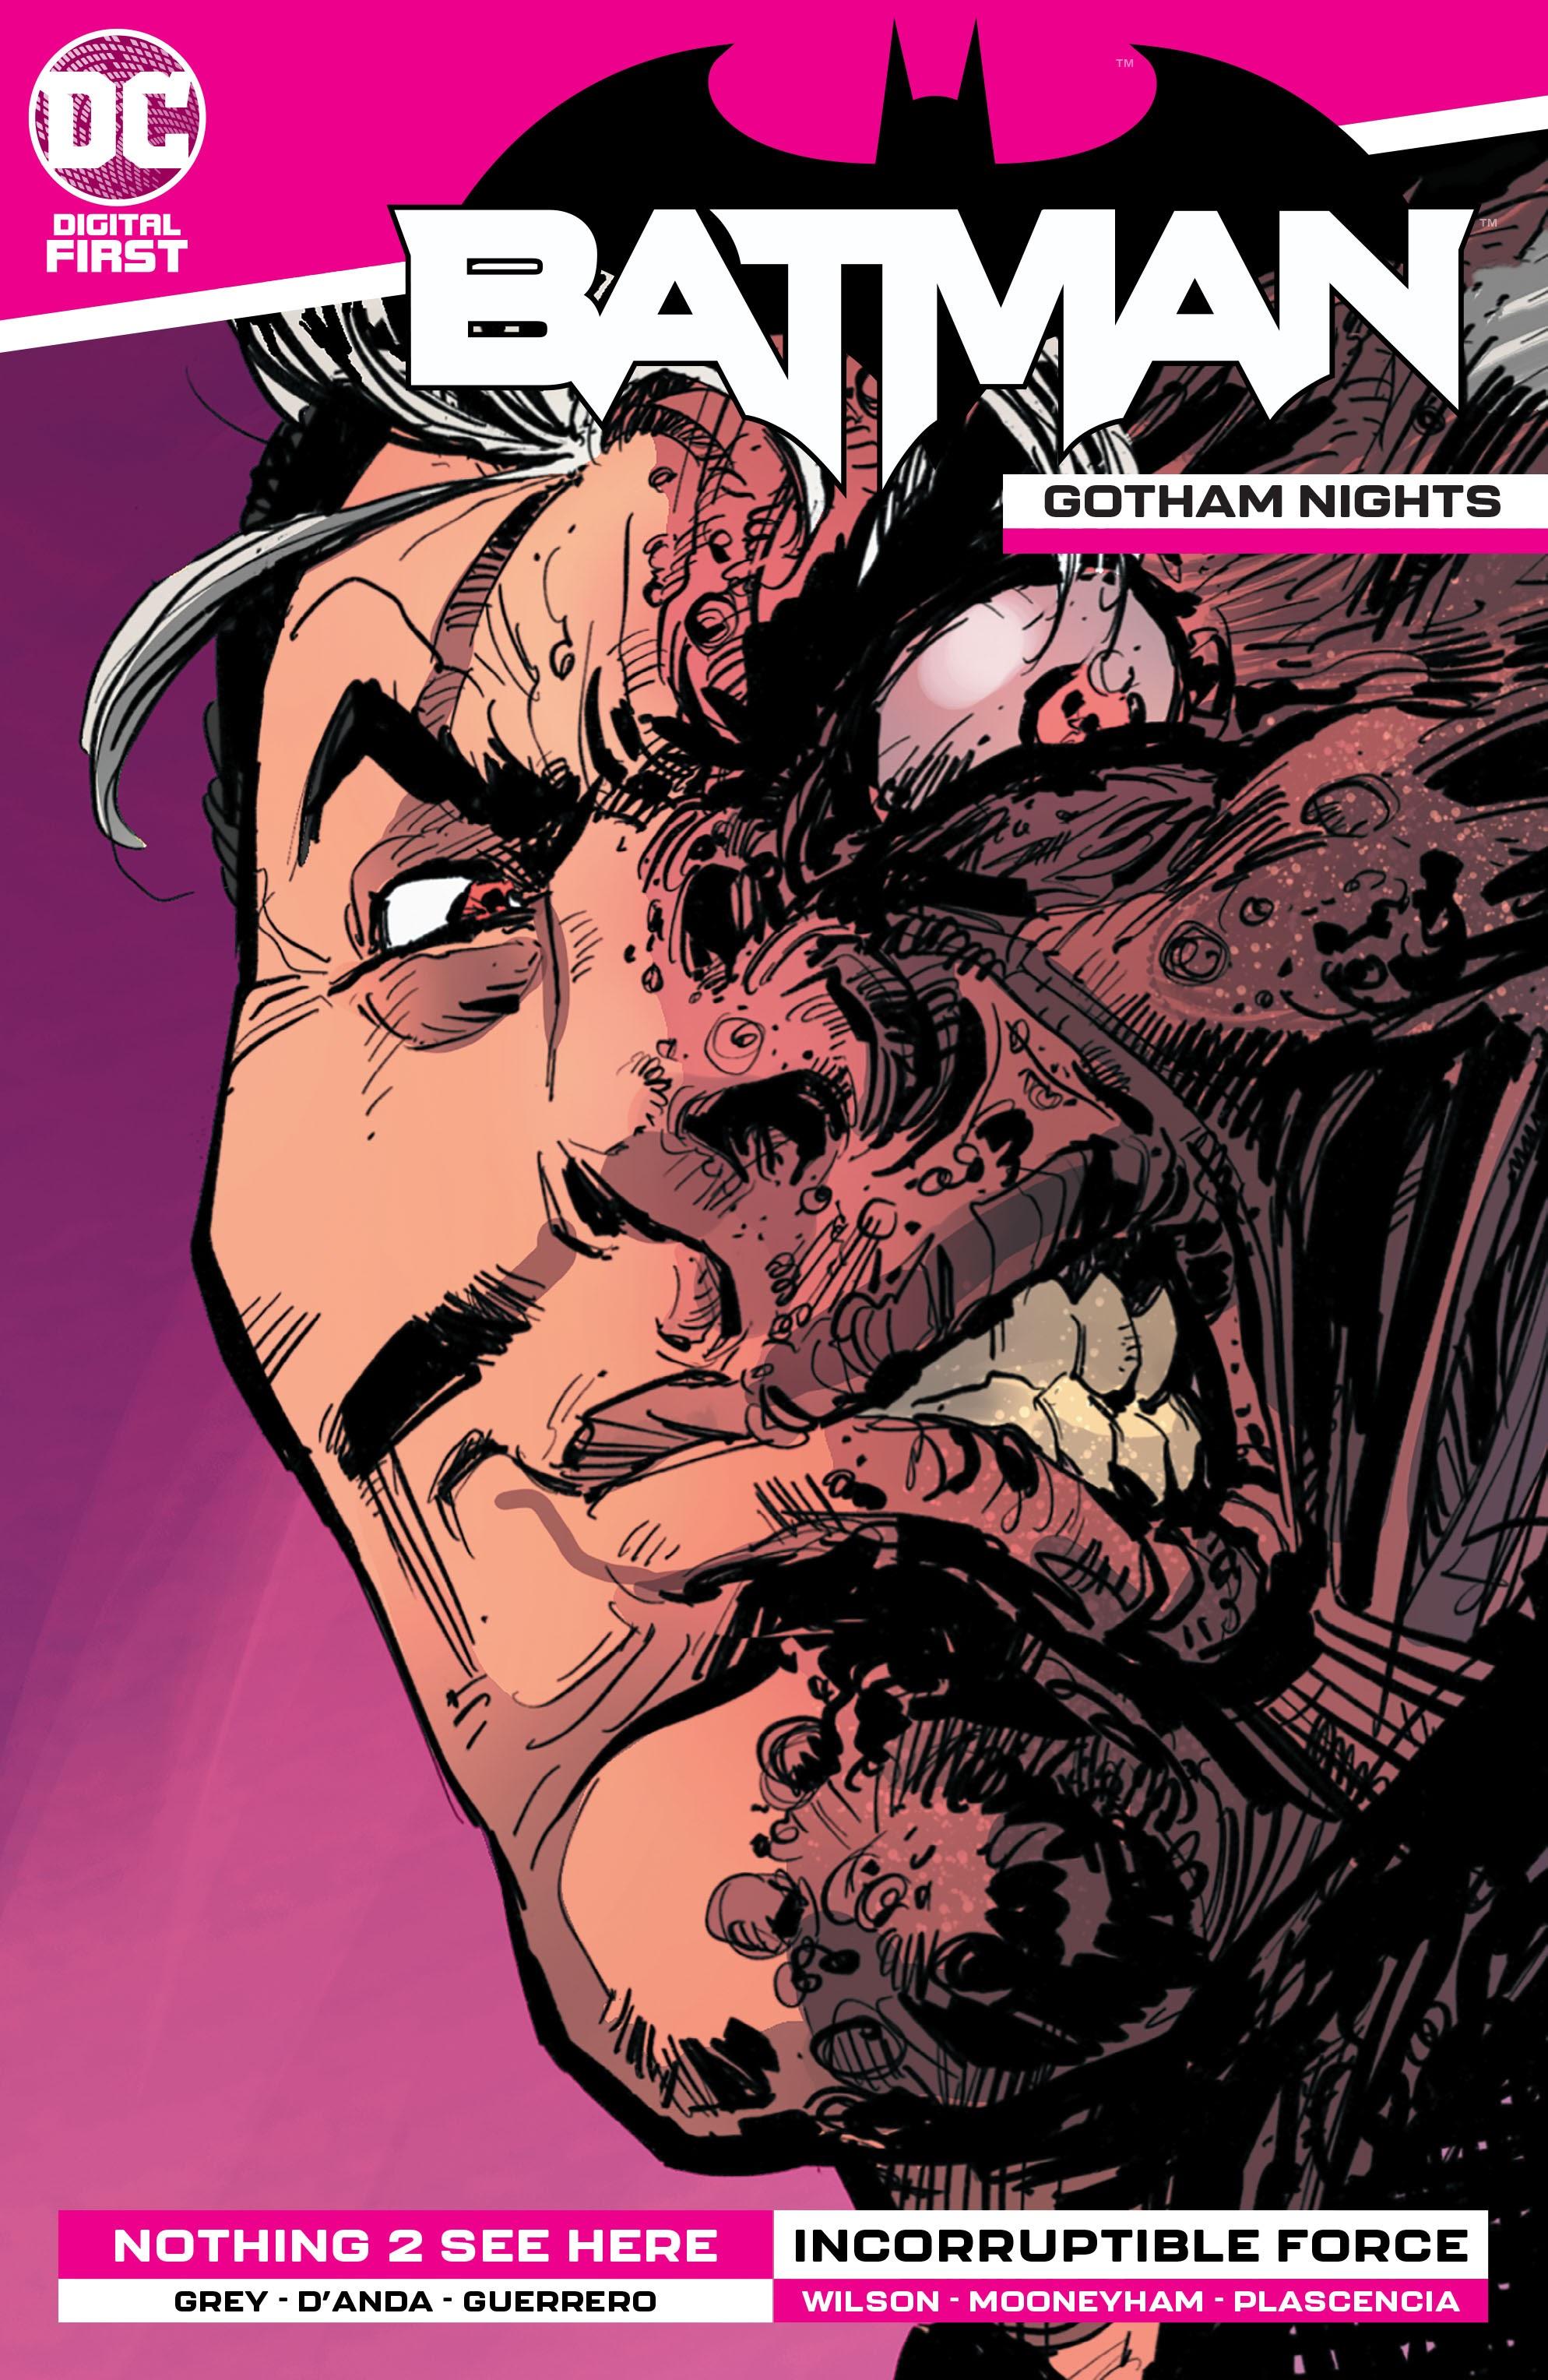 Batman: Gotham Nights Vol 1 13 (Digital)